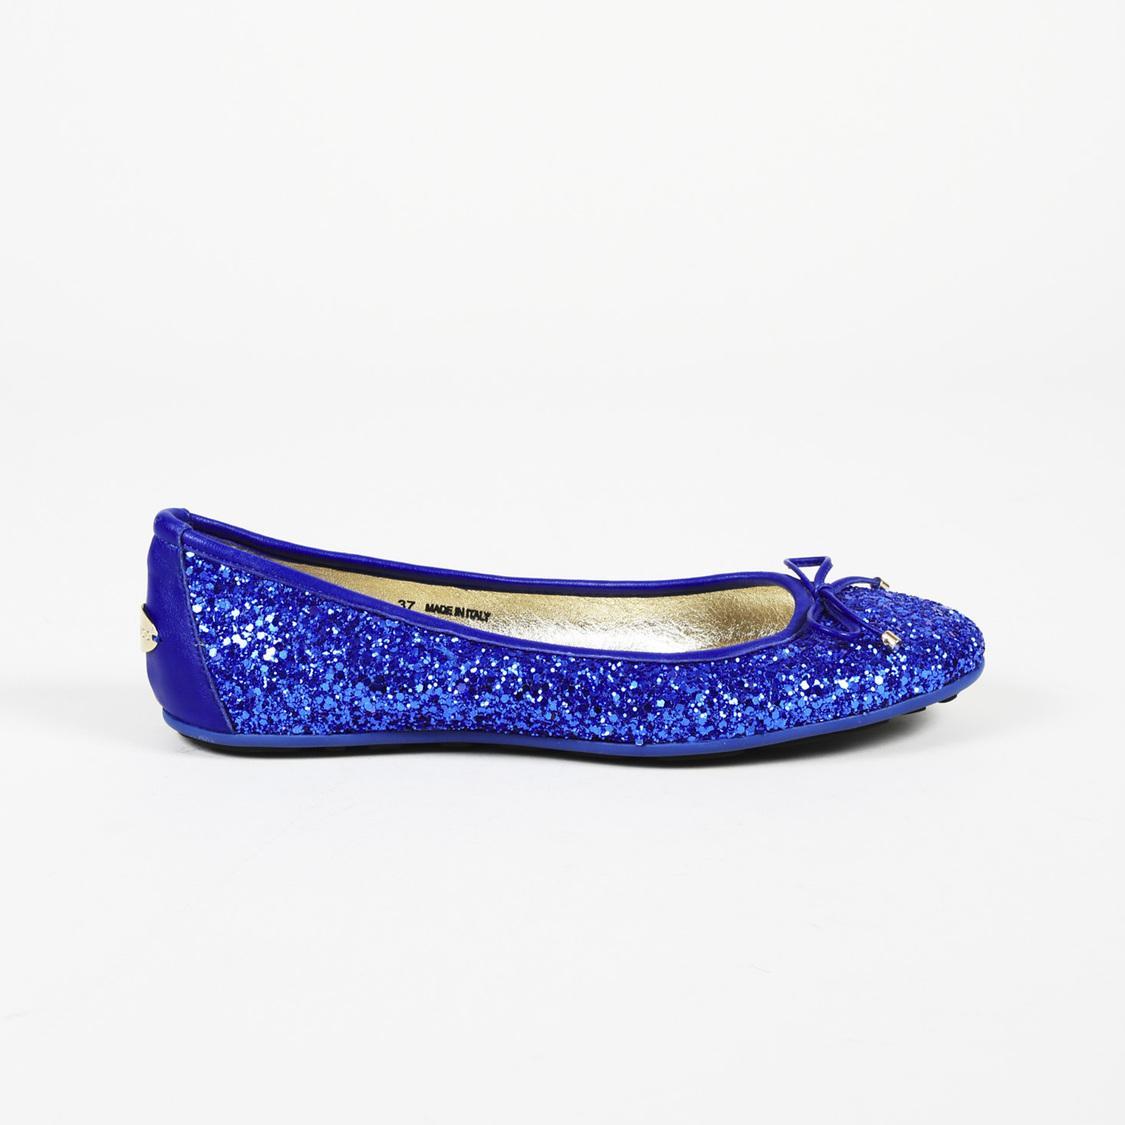 7fb2879f58c Lyst - Jimmy Choo Walsh Glitter Ballet Flats in Blue